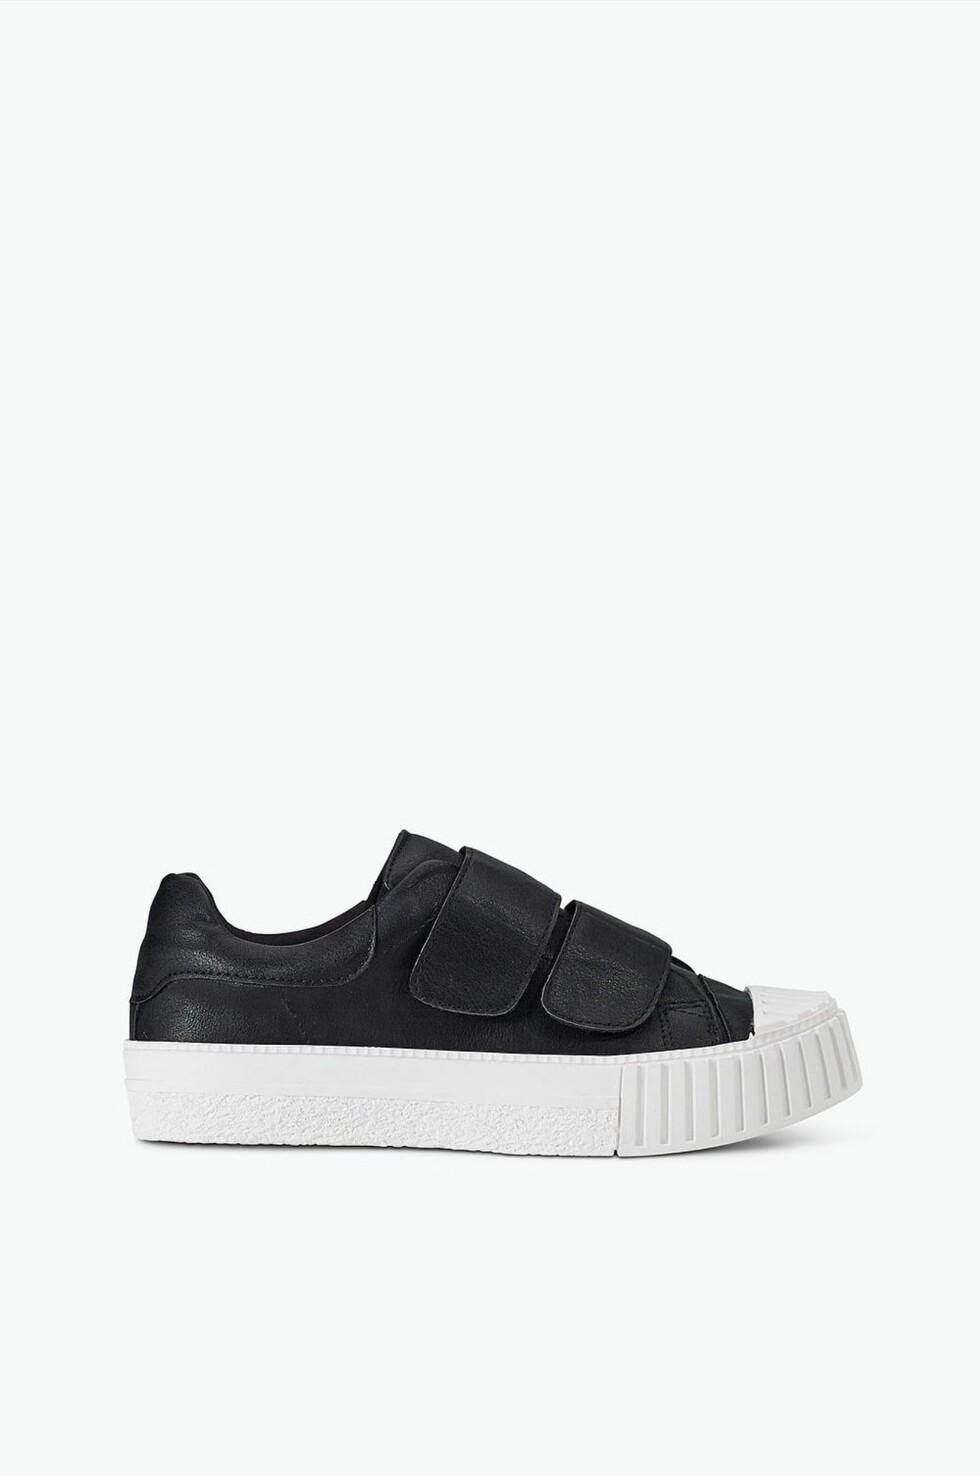 Sorte sneakers fra Ellos Shoes |kr 549 | http://apprl.com/sv/pd/4MNq/